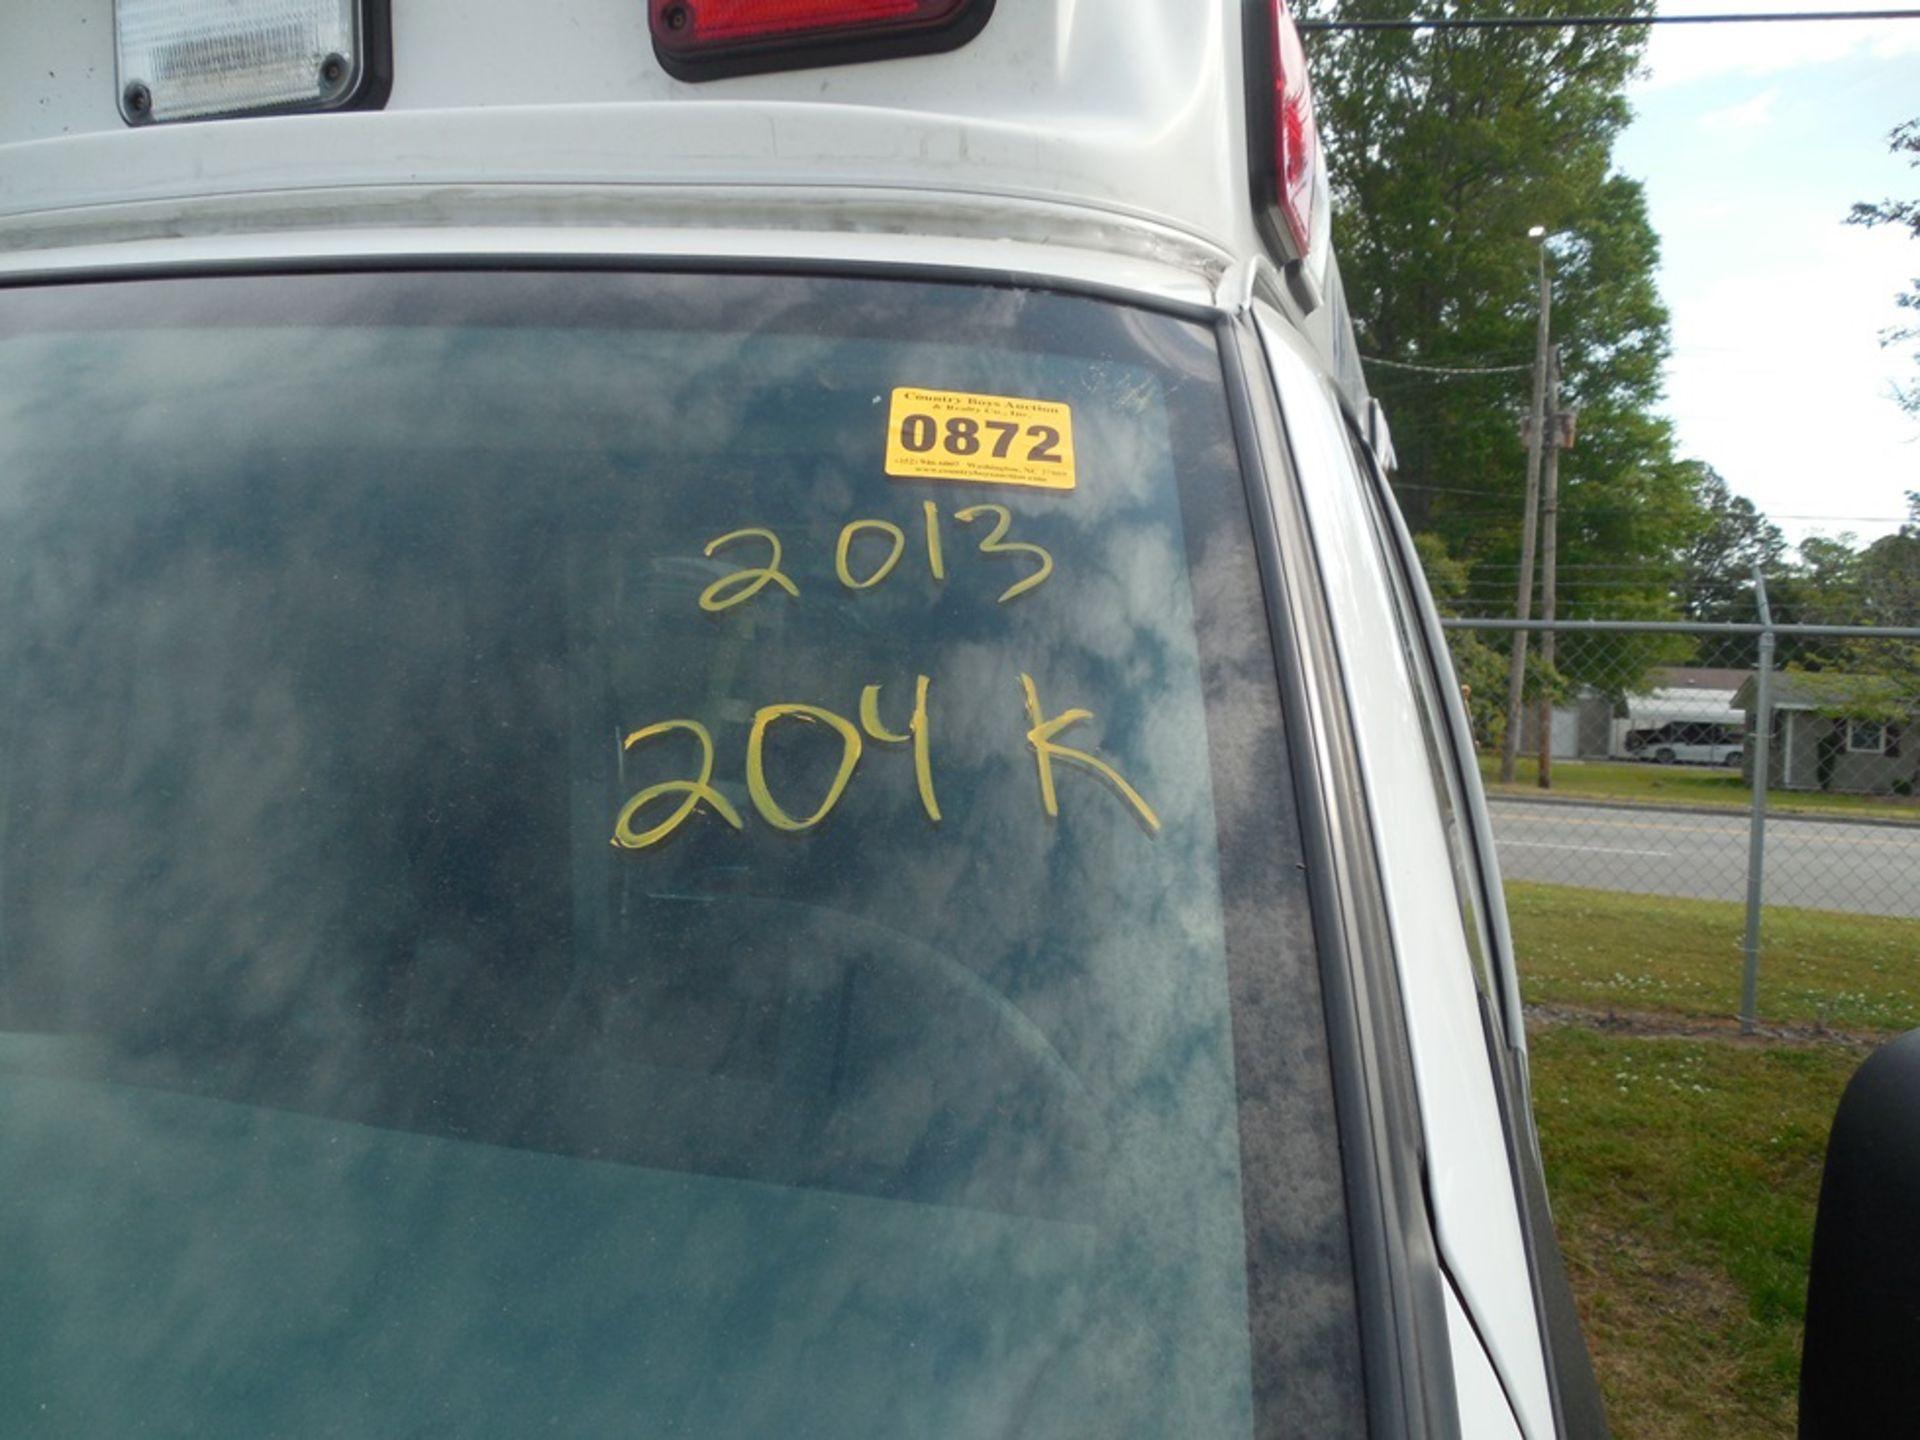 2013 Chev van ambulance dsl, Express Stable Trac 204,709 miles vin# 1GBZGUC13D1130018